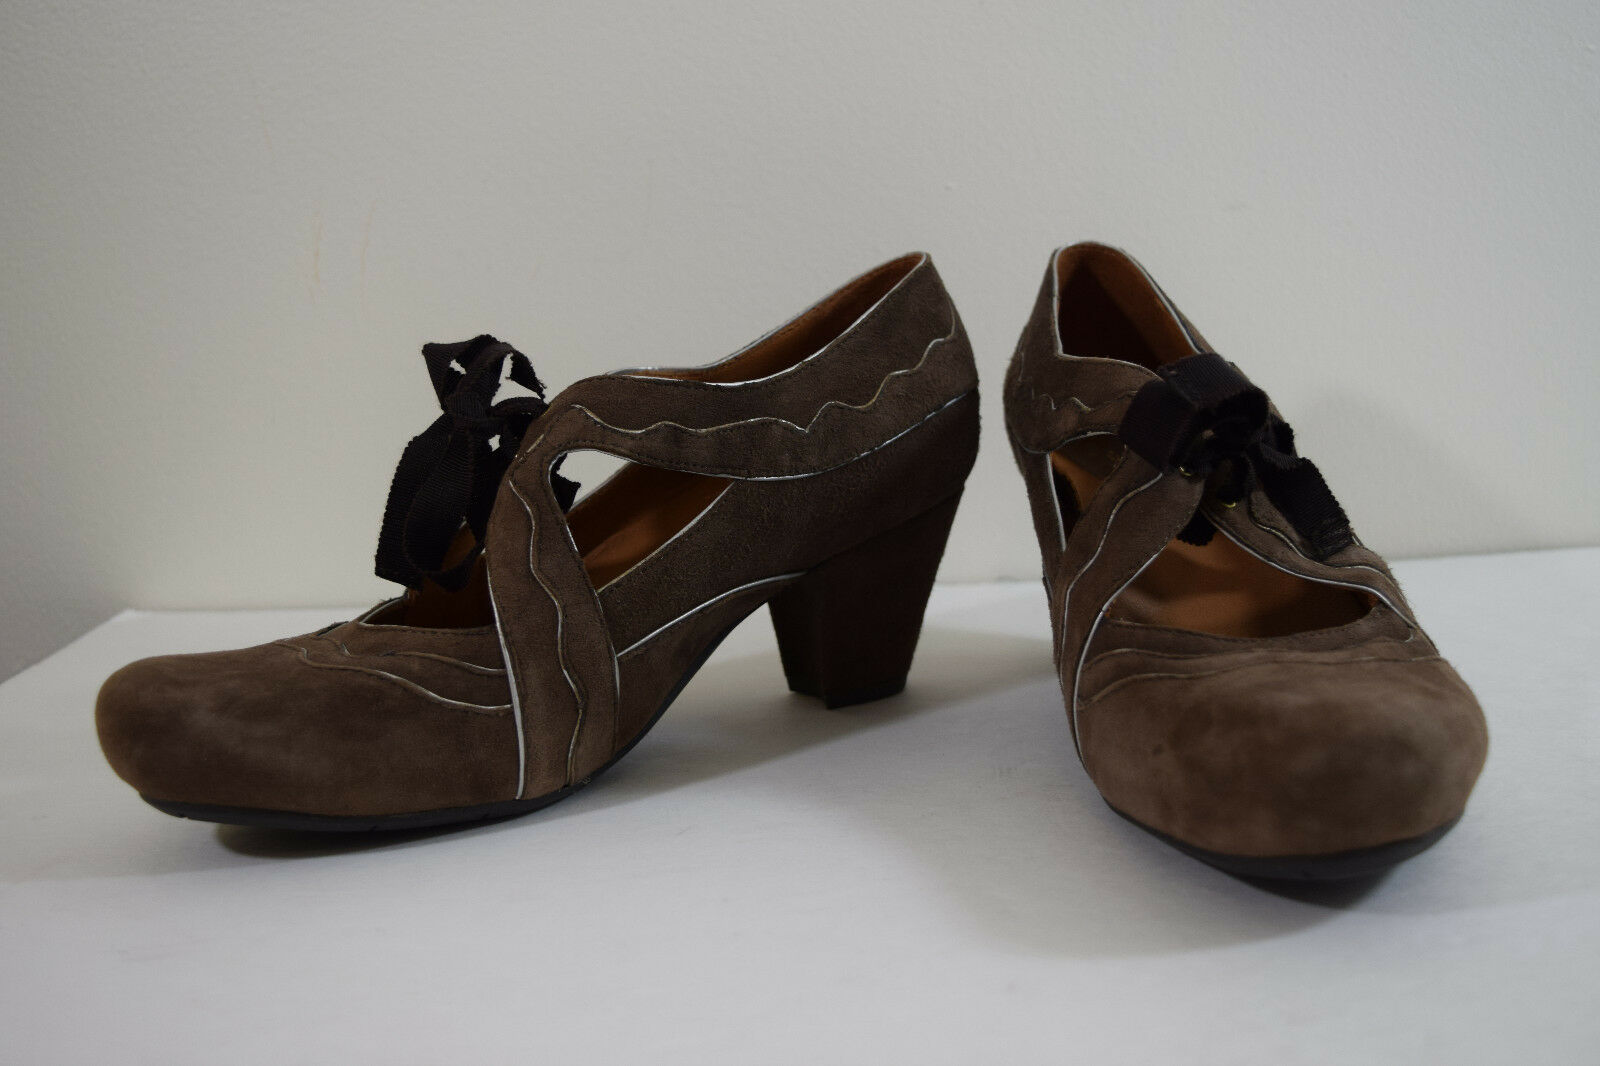 Earthies Damenschuhe Pump Heels 8.5 B Braun Taupe Suede Leder Casual Dress Schuhes